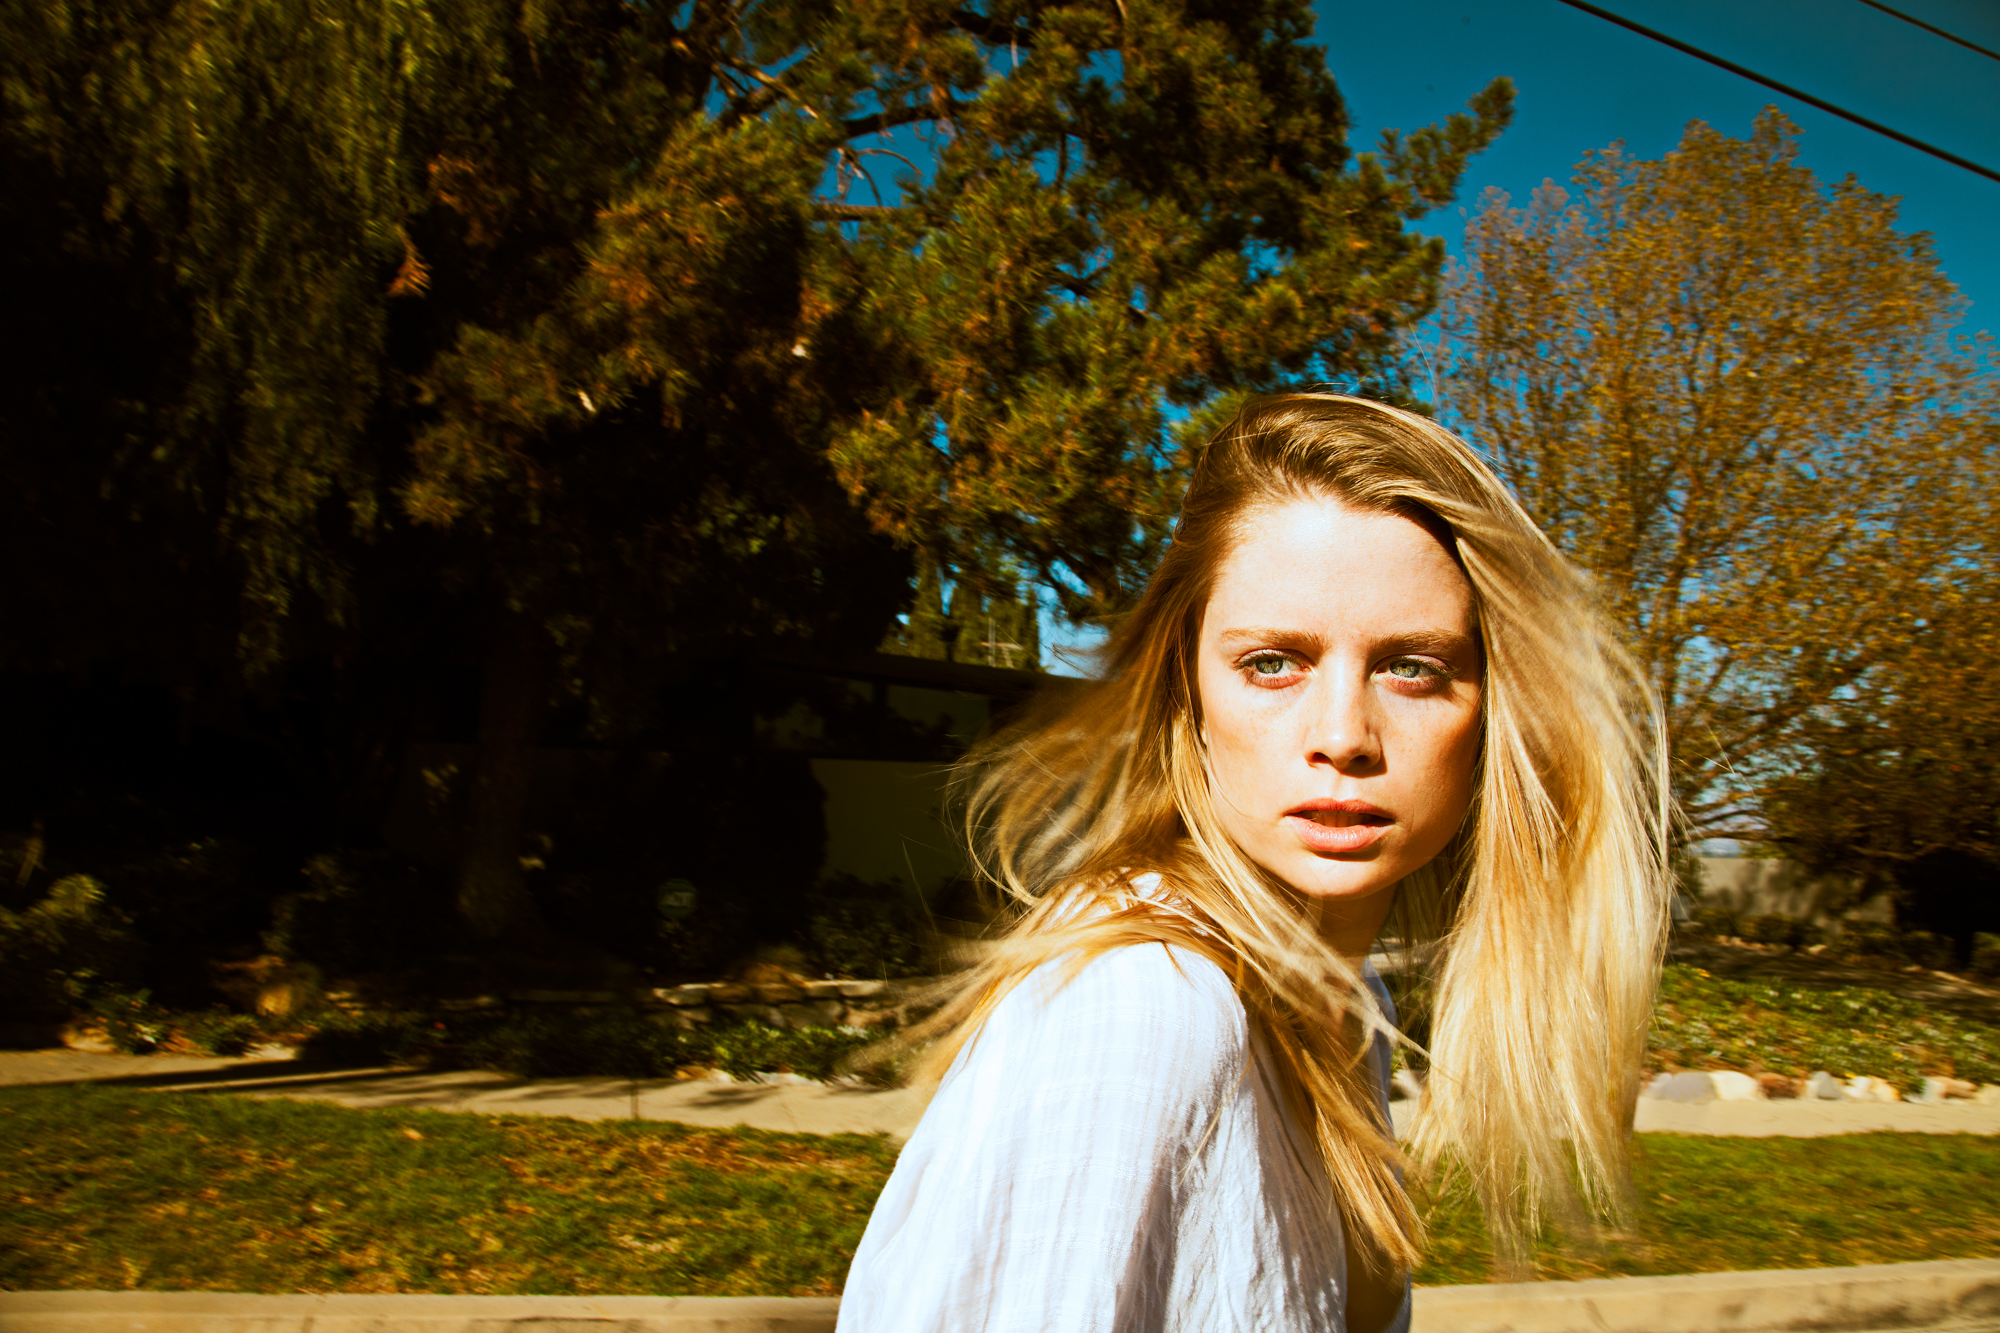 Photo by Kat Kaye